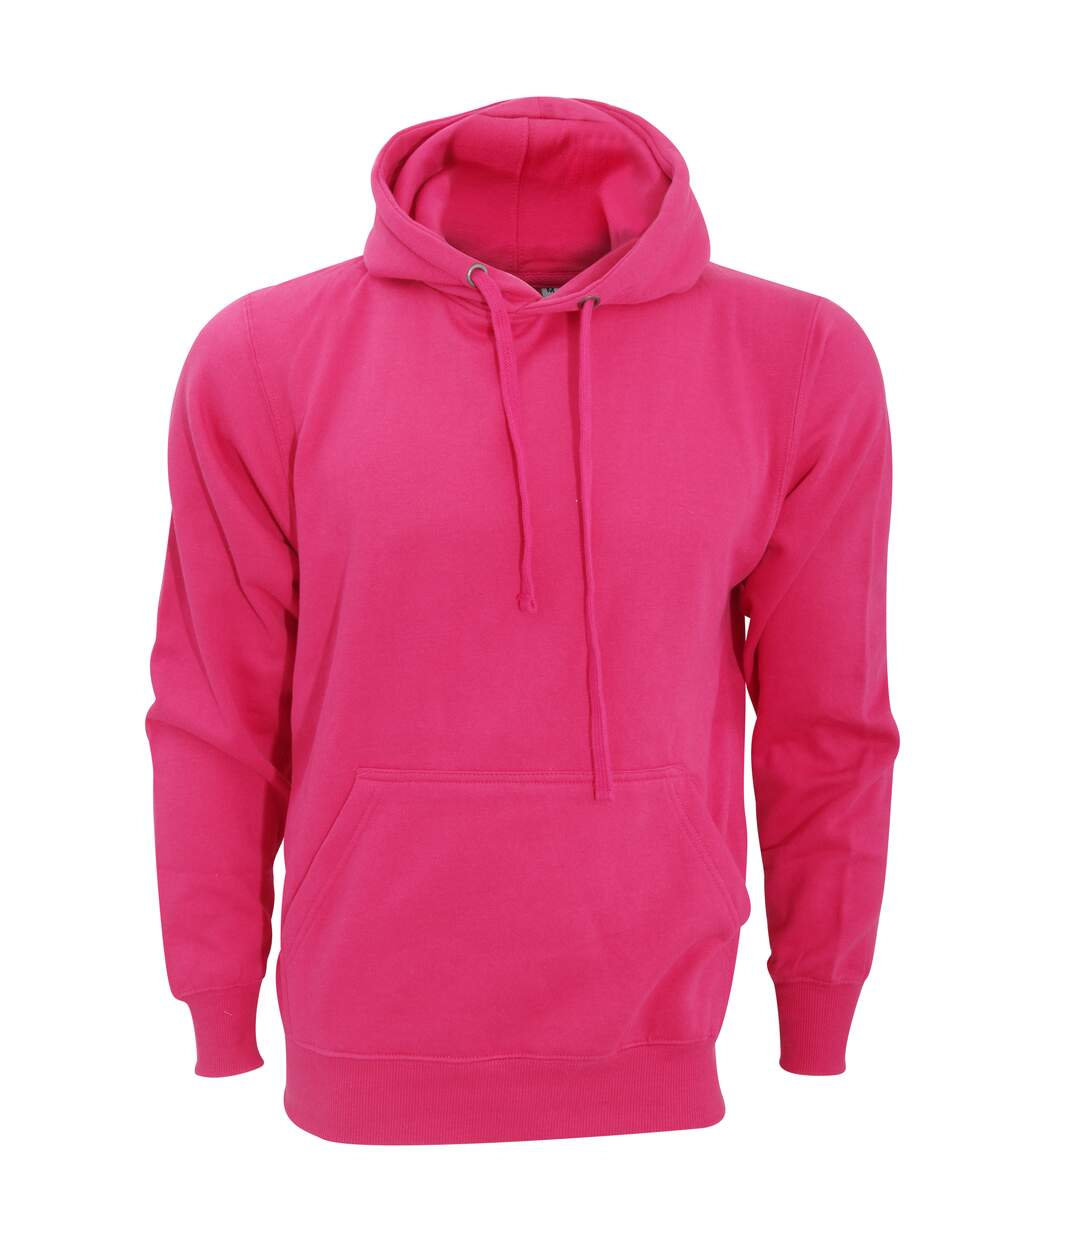 FDM Unisex Tagless Hooded Sweatshirt / Hoodie (Fuchsia) - UTBC2031